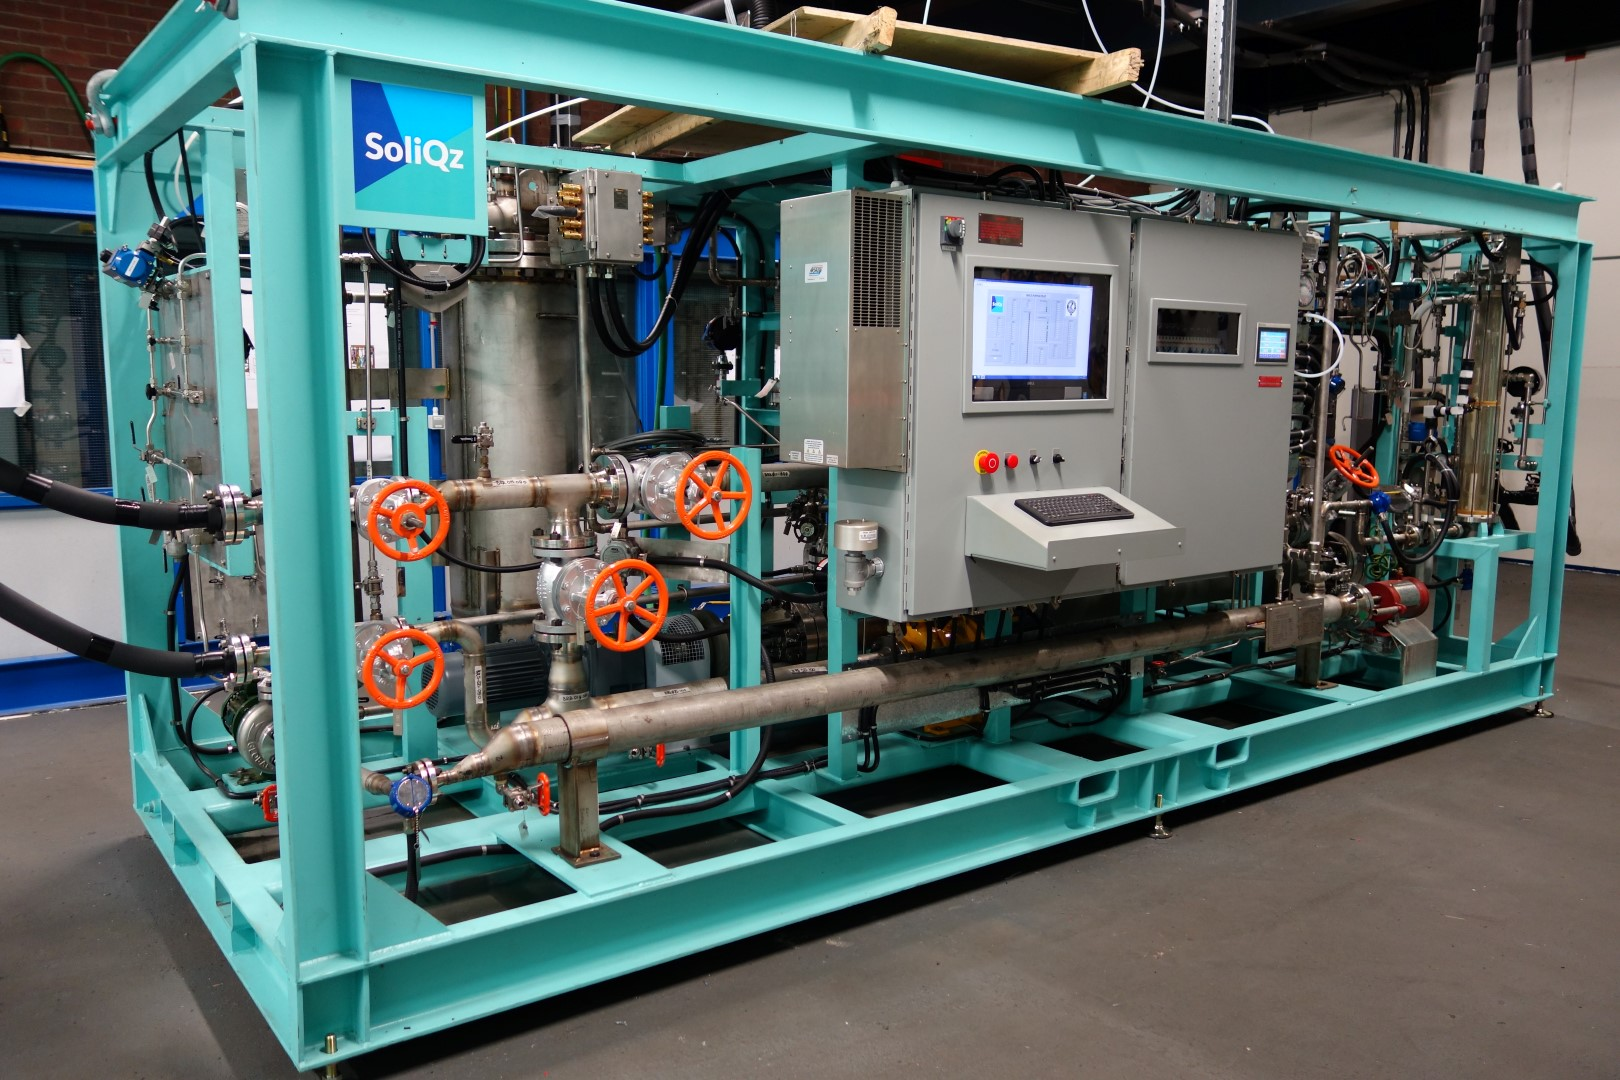 Plant One Rotterdam Soliqz fabriek machine